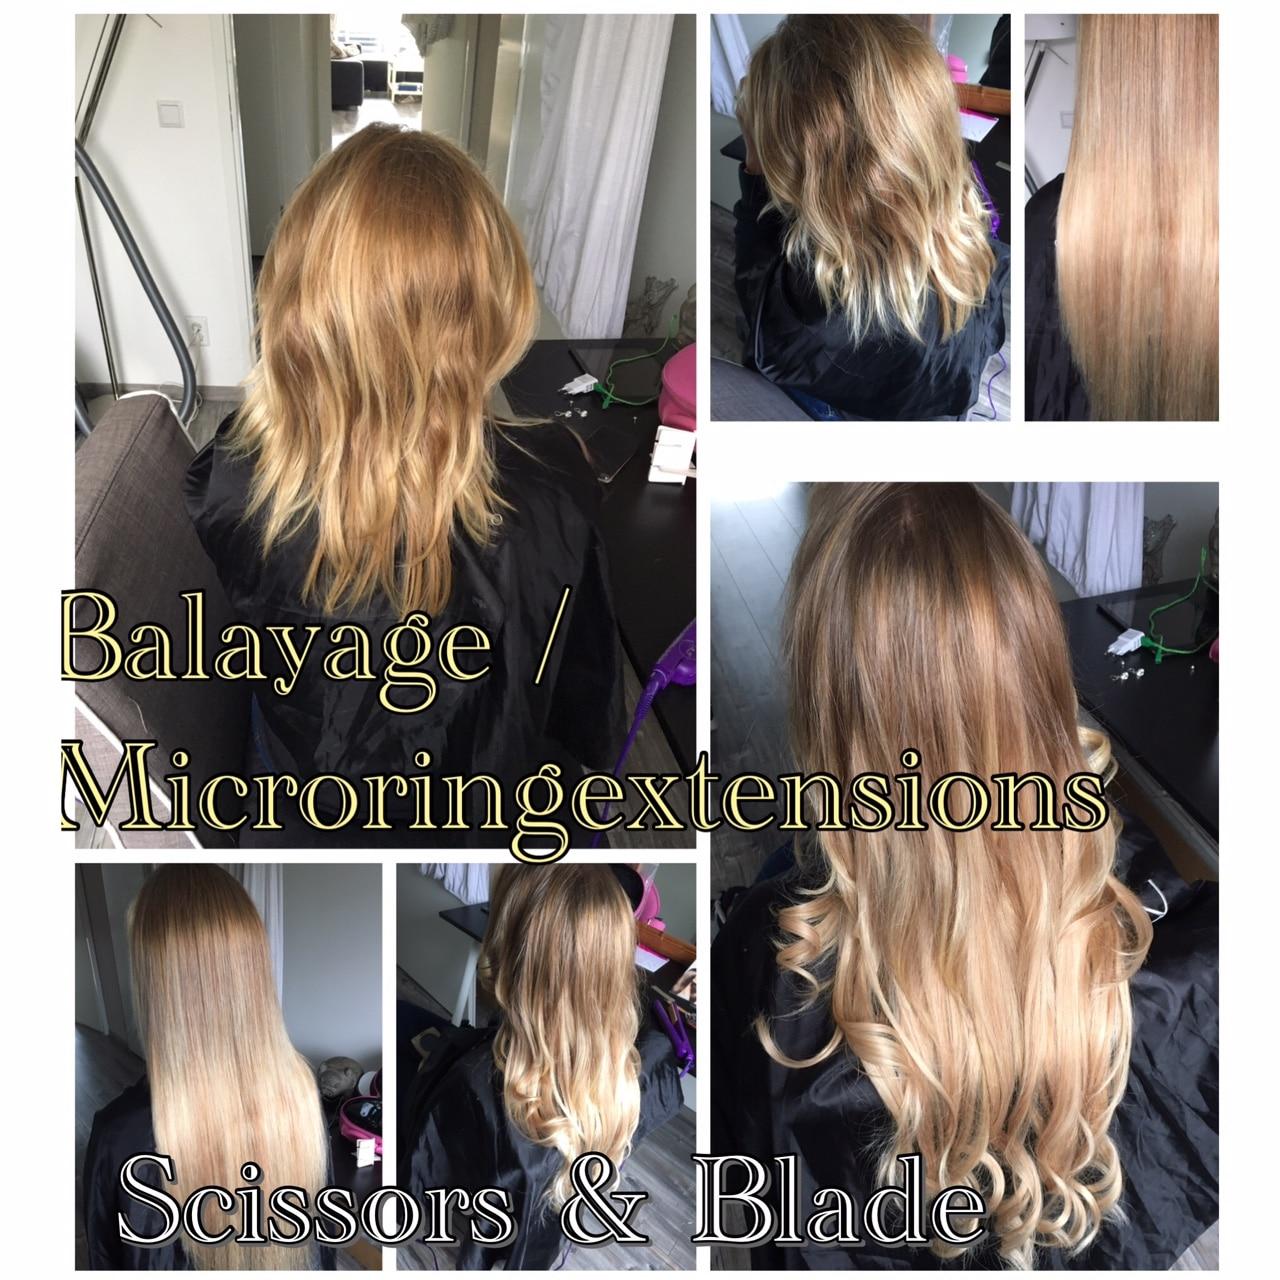 scissors-blade hairweave